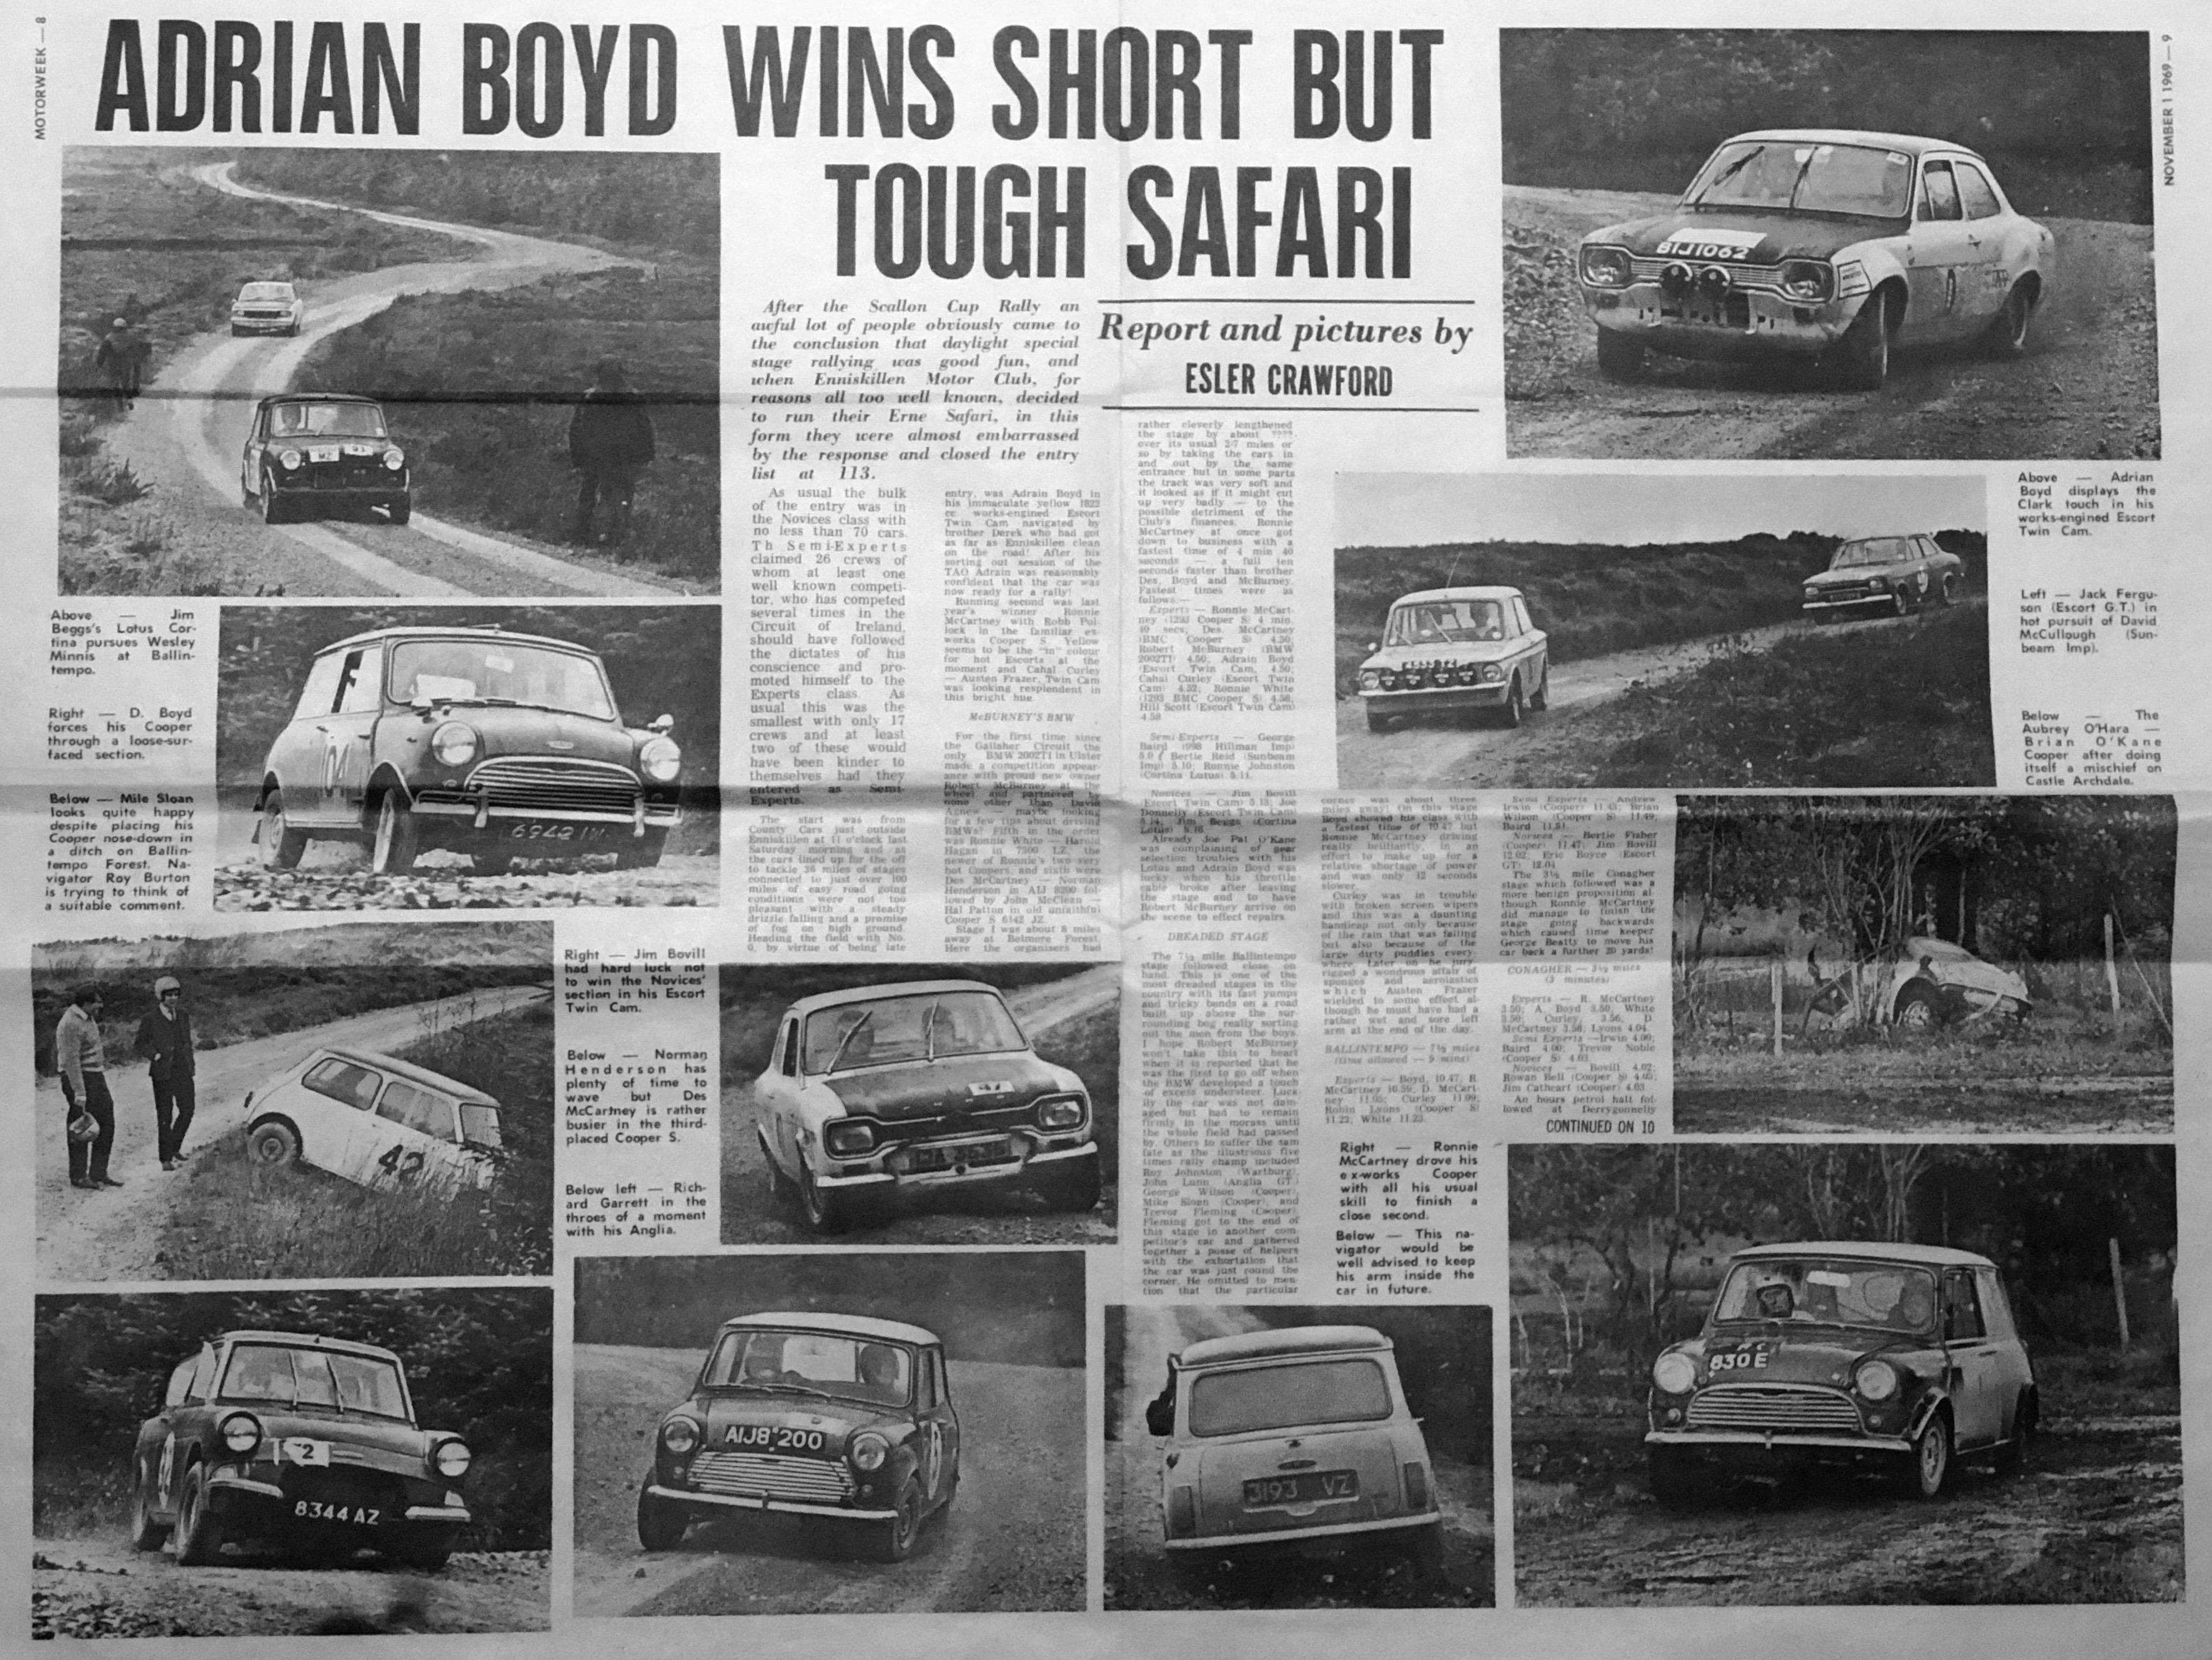 1969 erne safari rally dungannon motor club dungannon motor club